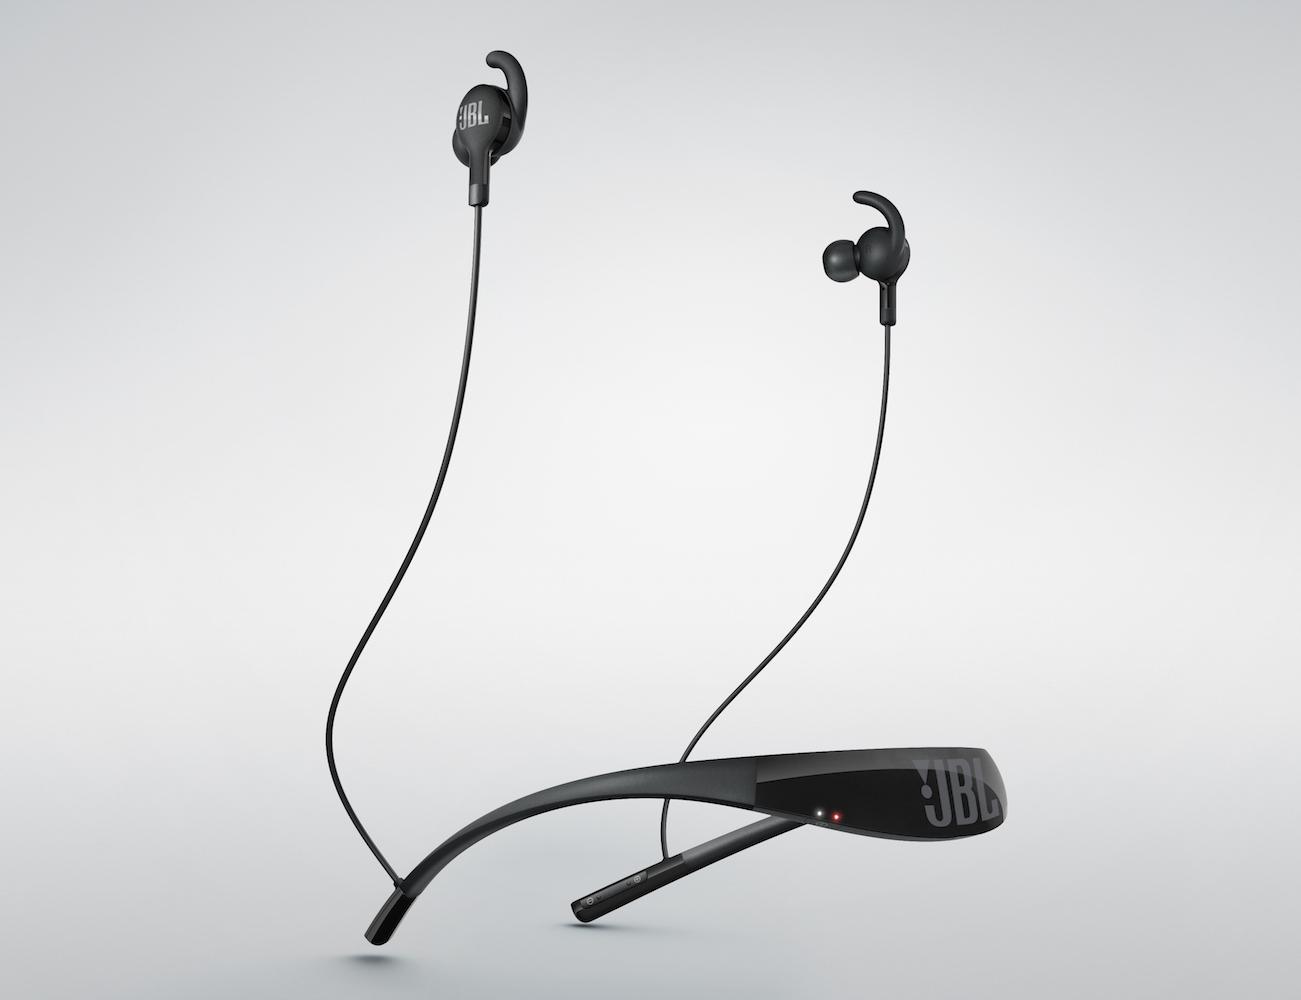 Jbl everest 100 replacement earbuds - jbl sport earbuds wireless